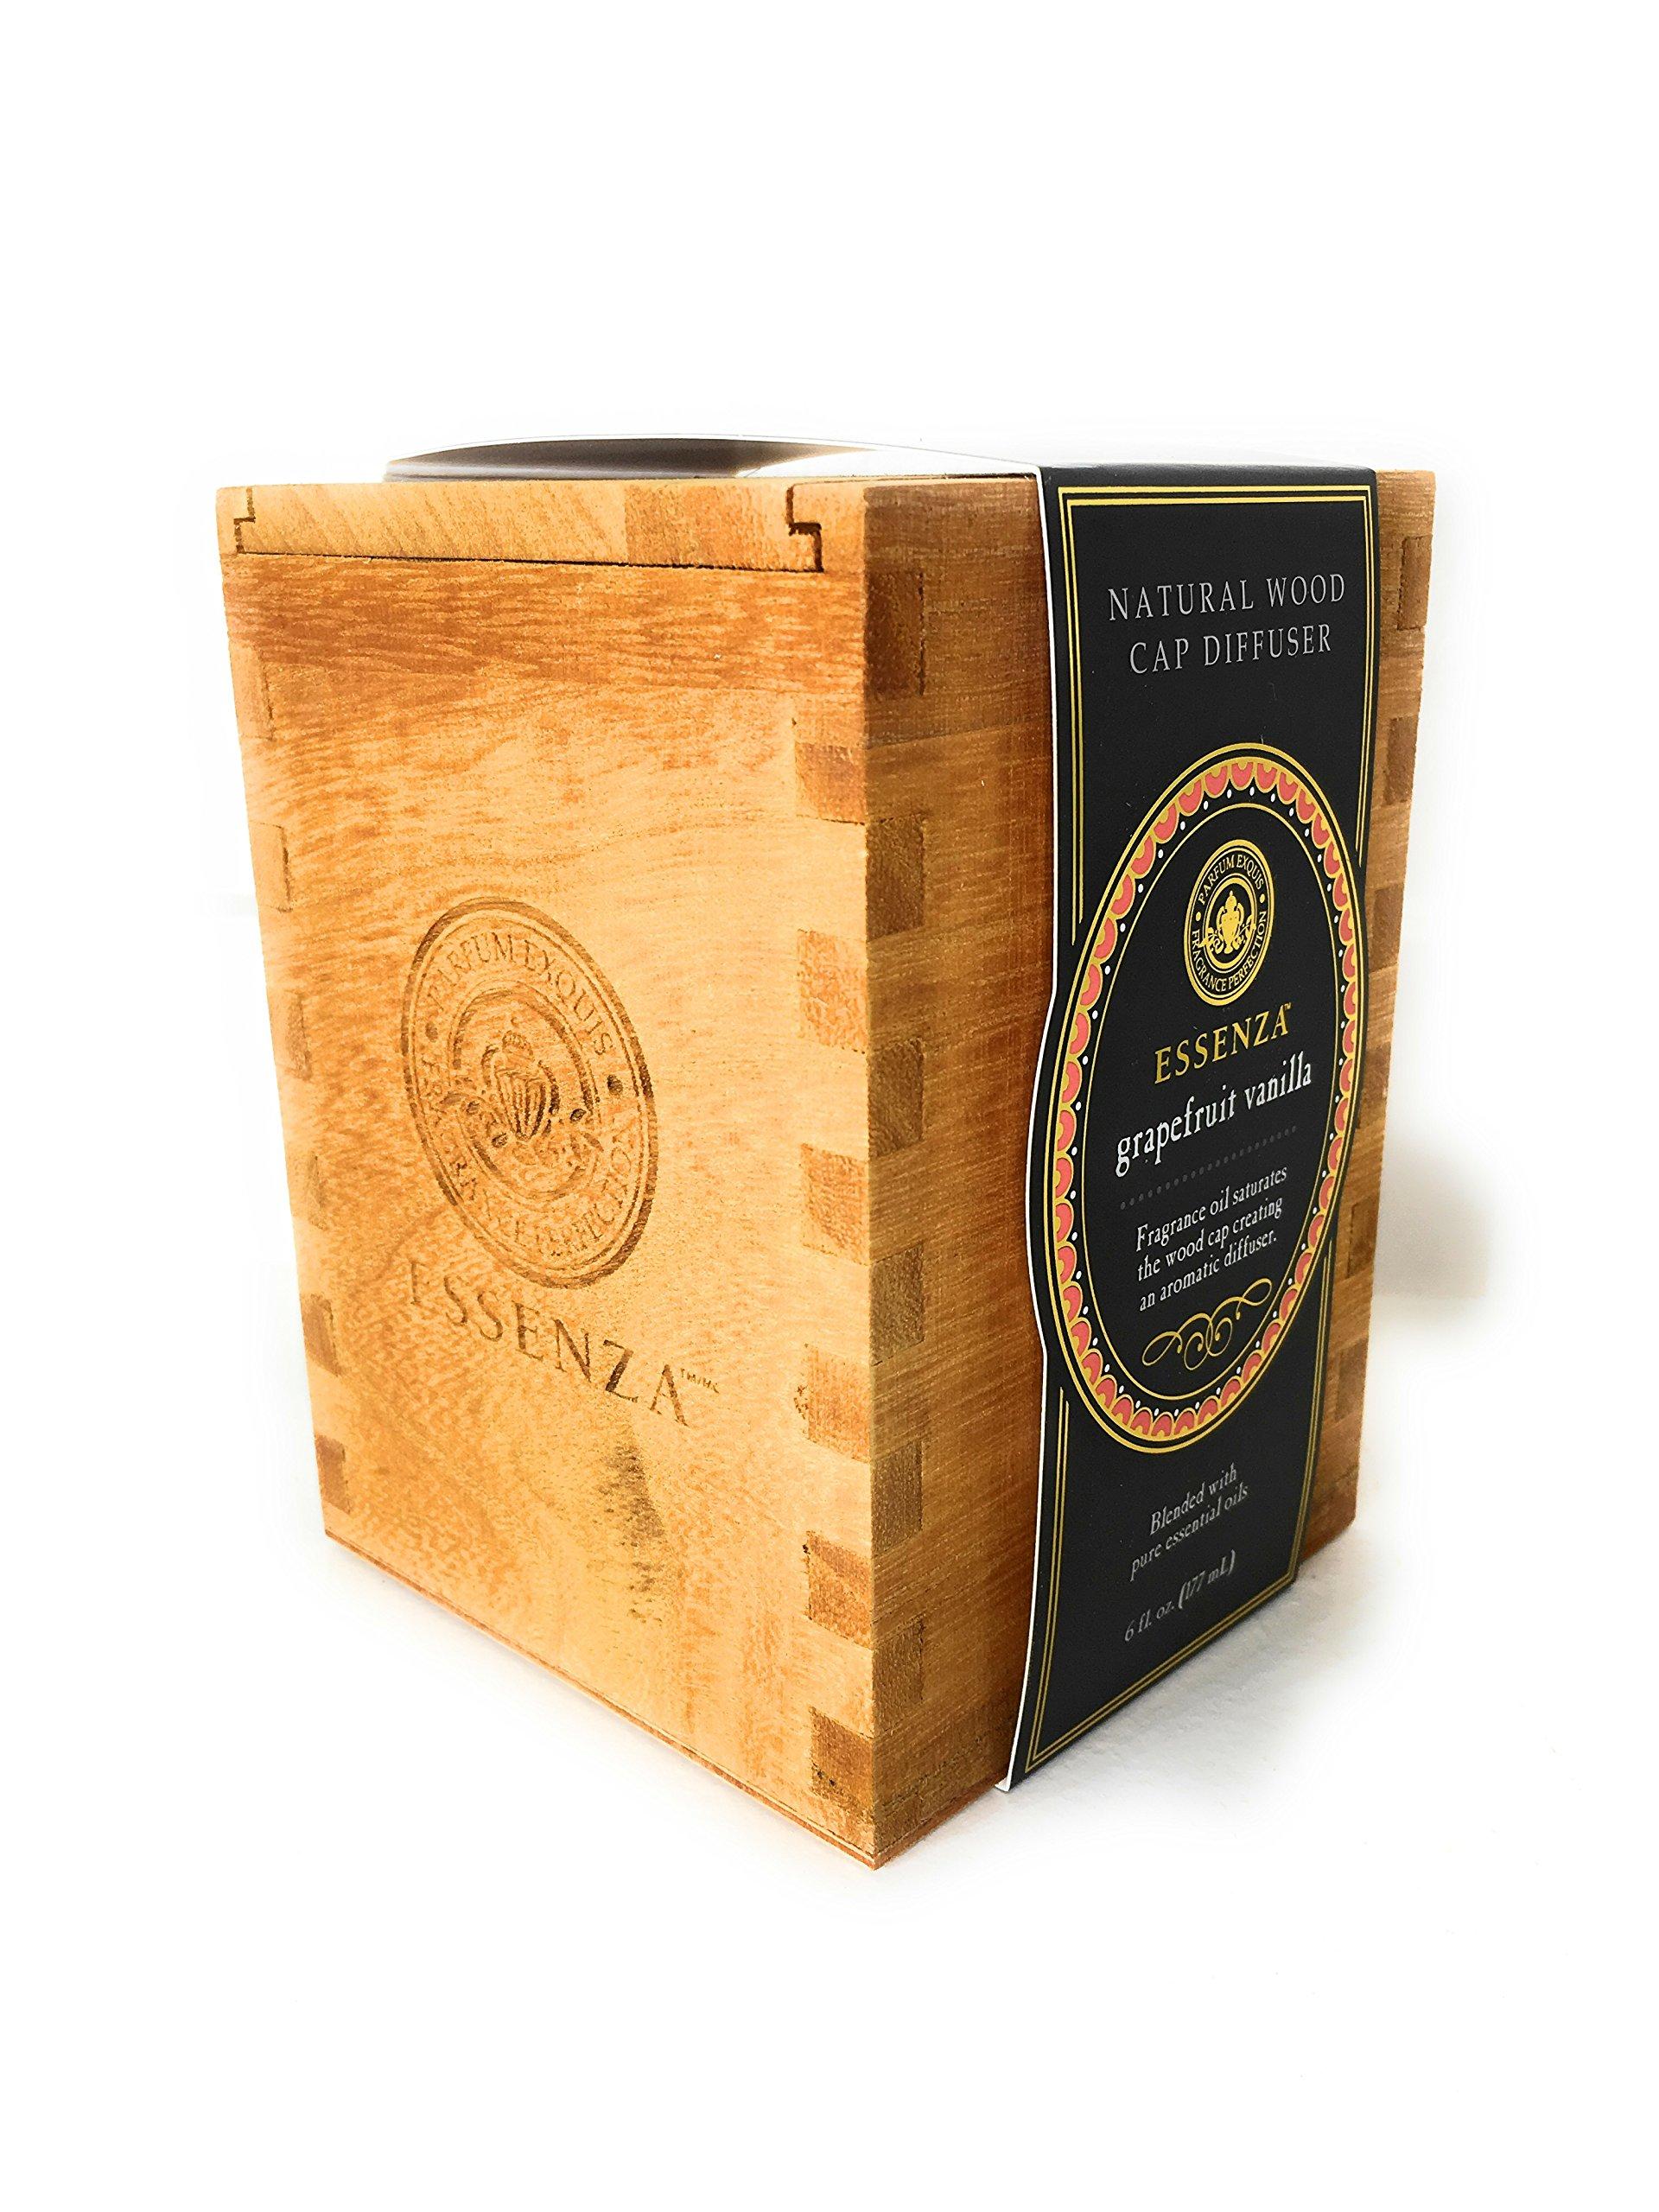 Essenza Natural wood cap diffuser Variety 2 Pack (Grapefruit Vanilla & Lily Linen)